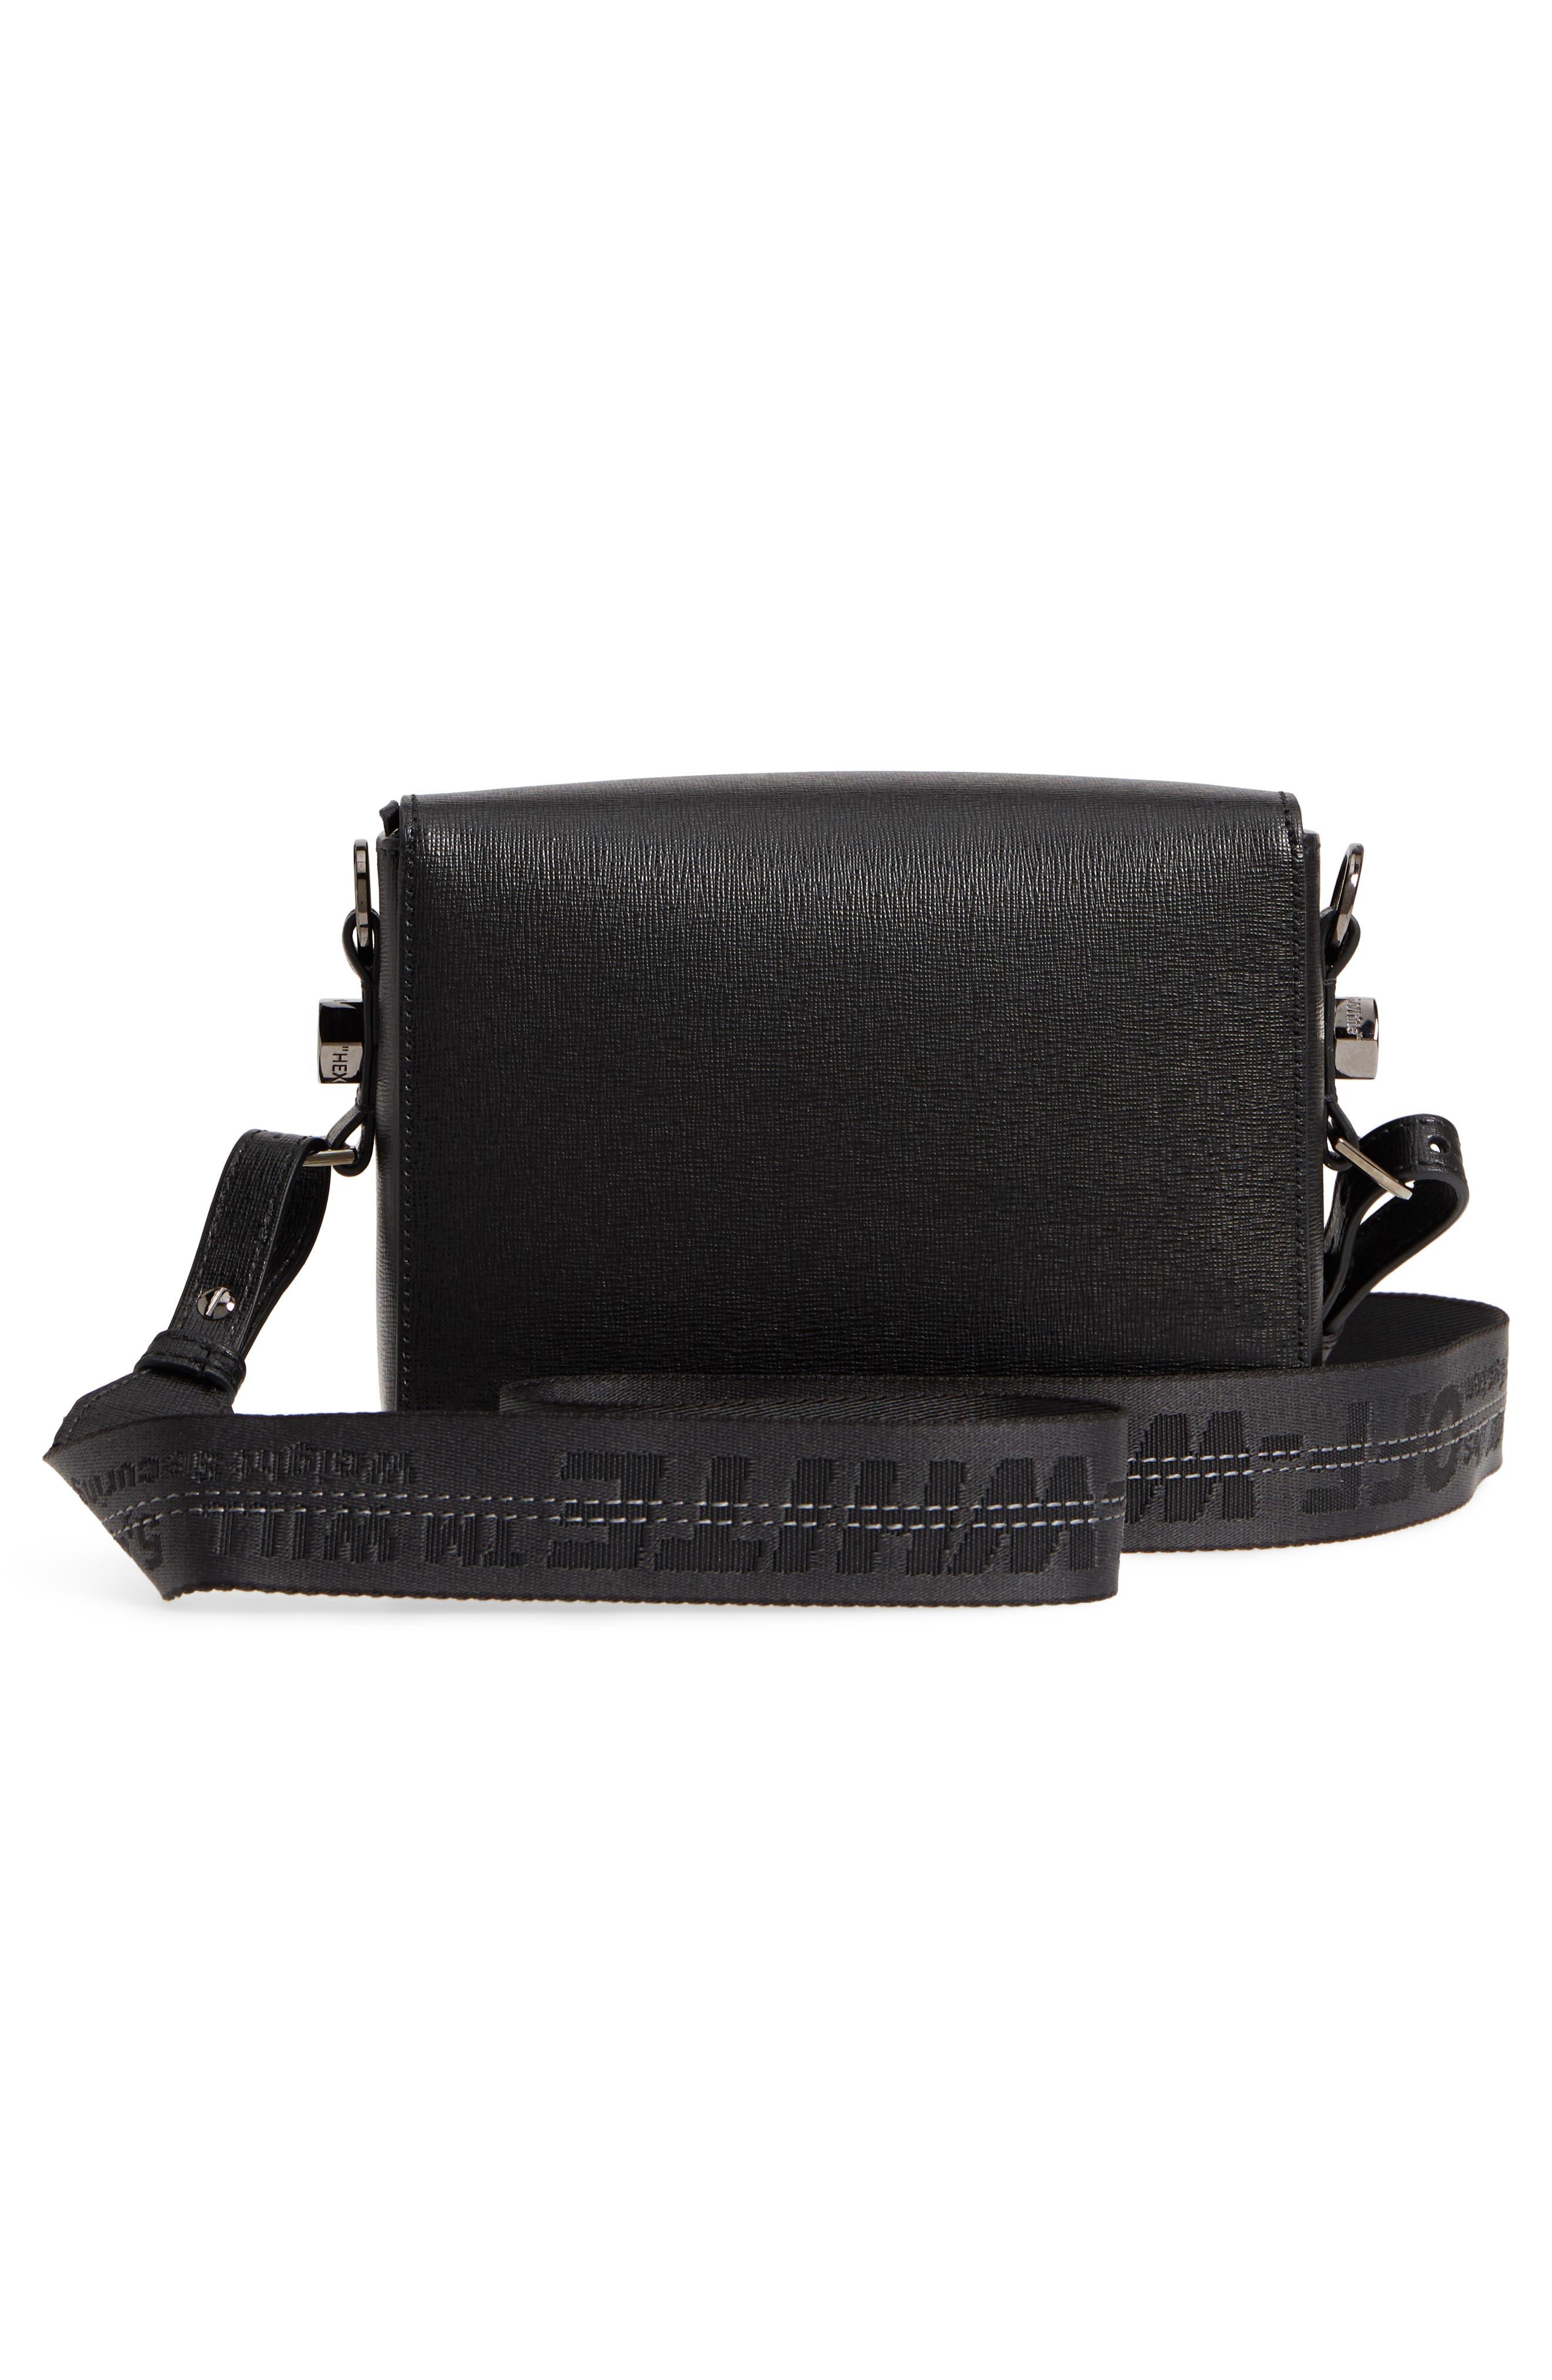 Binder Clip Leather Flap Bag,                             Alternate thumbnail 4, color,                             Black